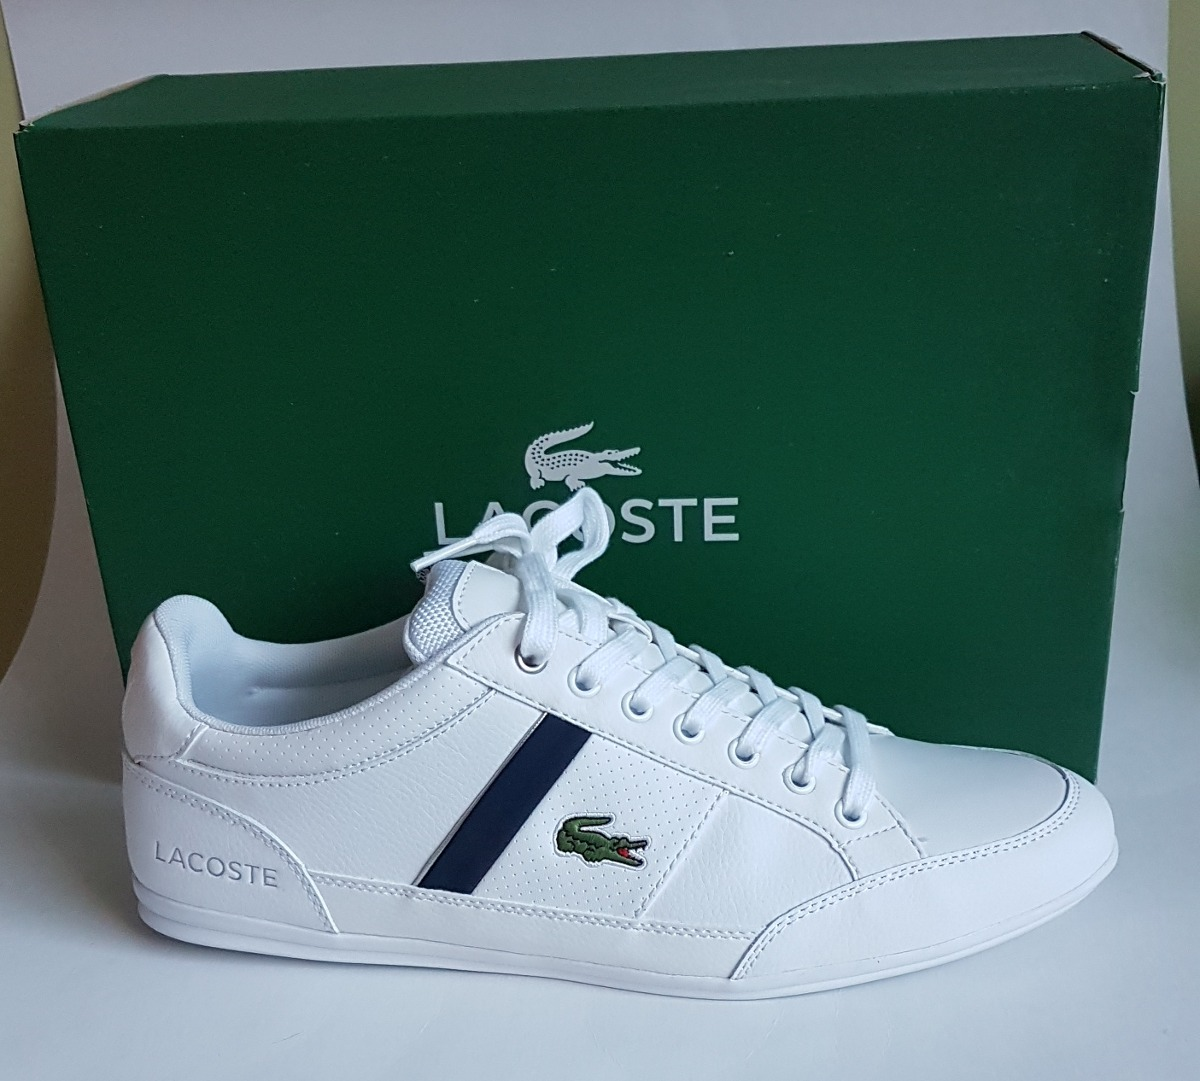 Tenis Lacoste Chaymon Leather Branco T39 - R  590,00 em Mercado Livre da2e5766bd